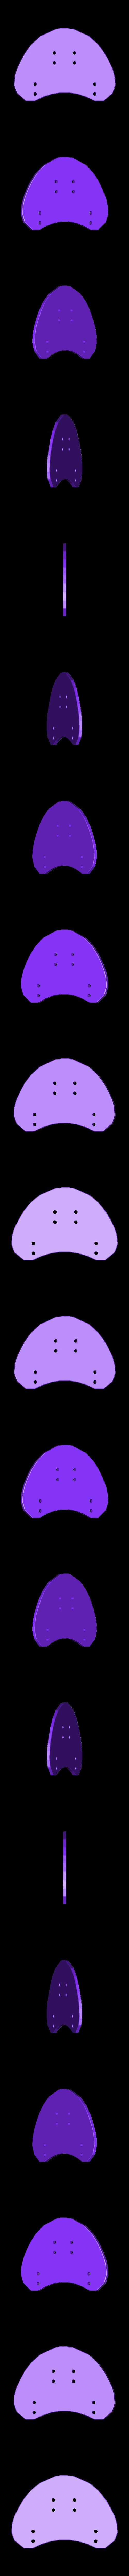 v1.stl Download free STL file Swimming Paddles • 3D printer object, Linshell3Dgirl